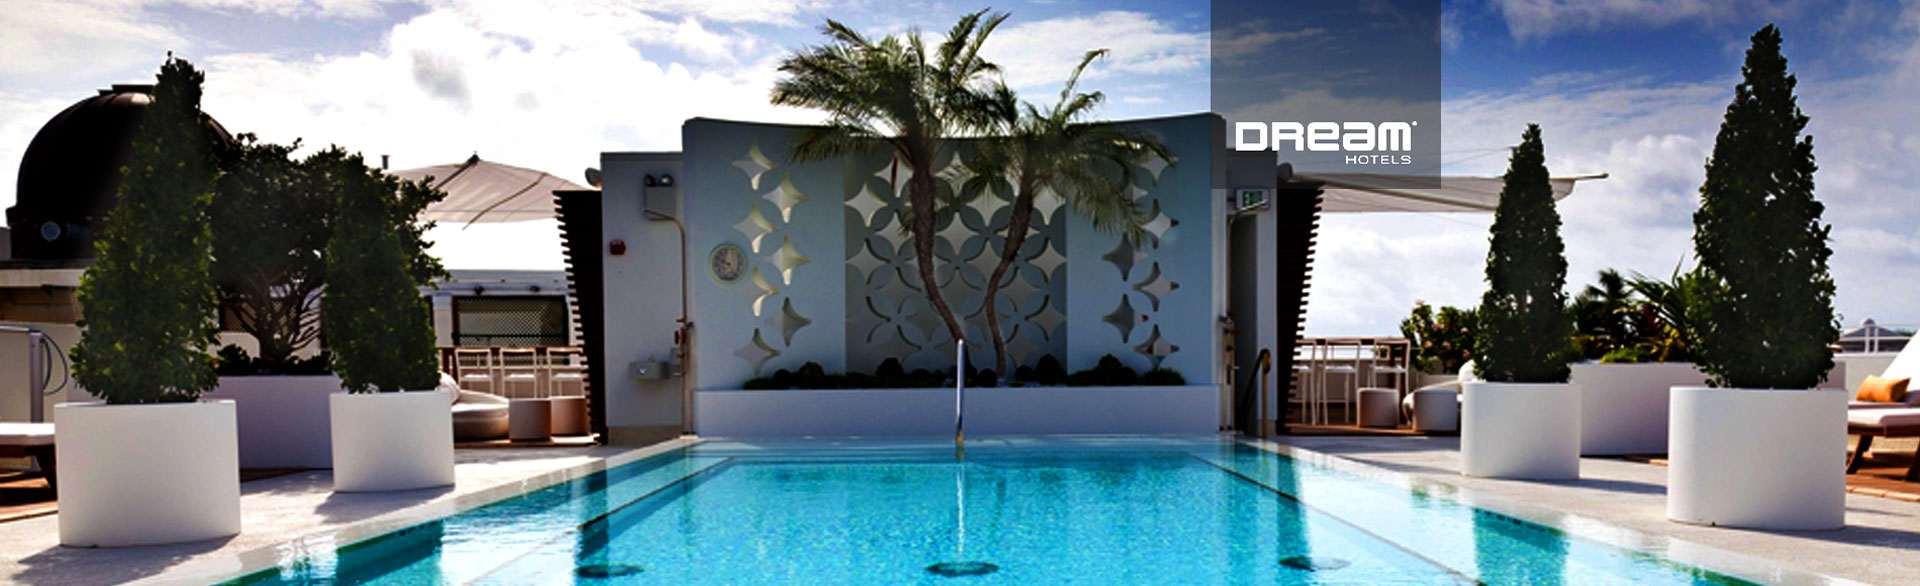 sliders_hotels_dream Soho Beach House Miami Spa